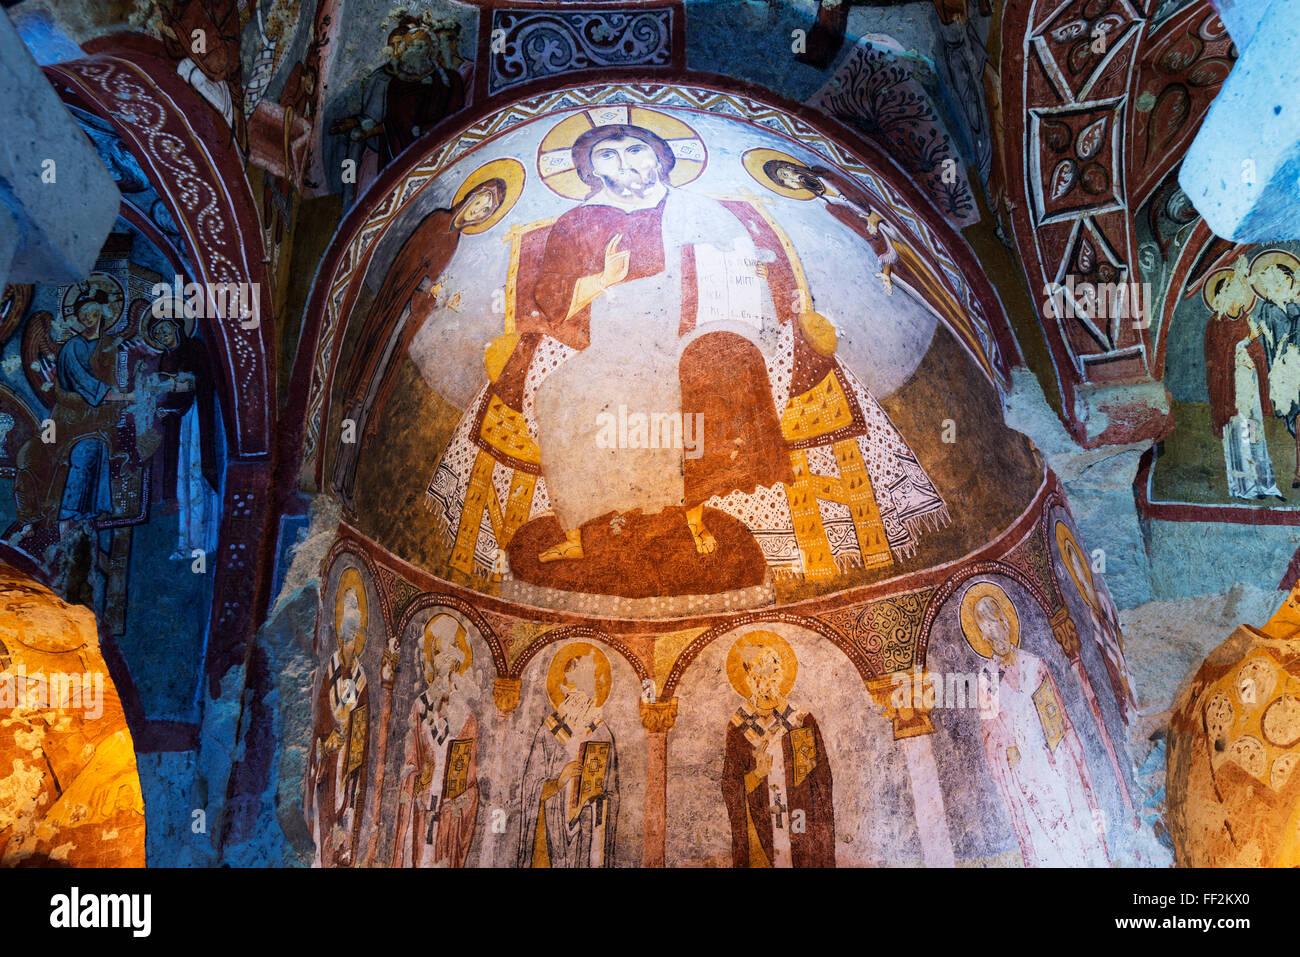 Open Air Museum, UNESCO WorRMd Heritage Site, Goreme, Cappadocia, AnatoRMia, Turkey, Asia Minor, Eurasia - Stock Image